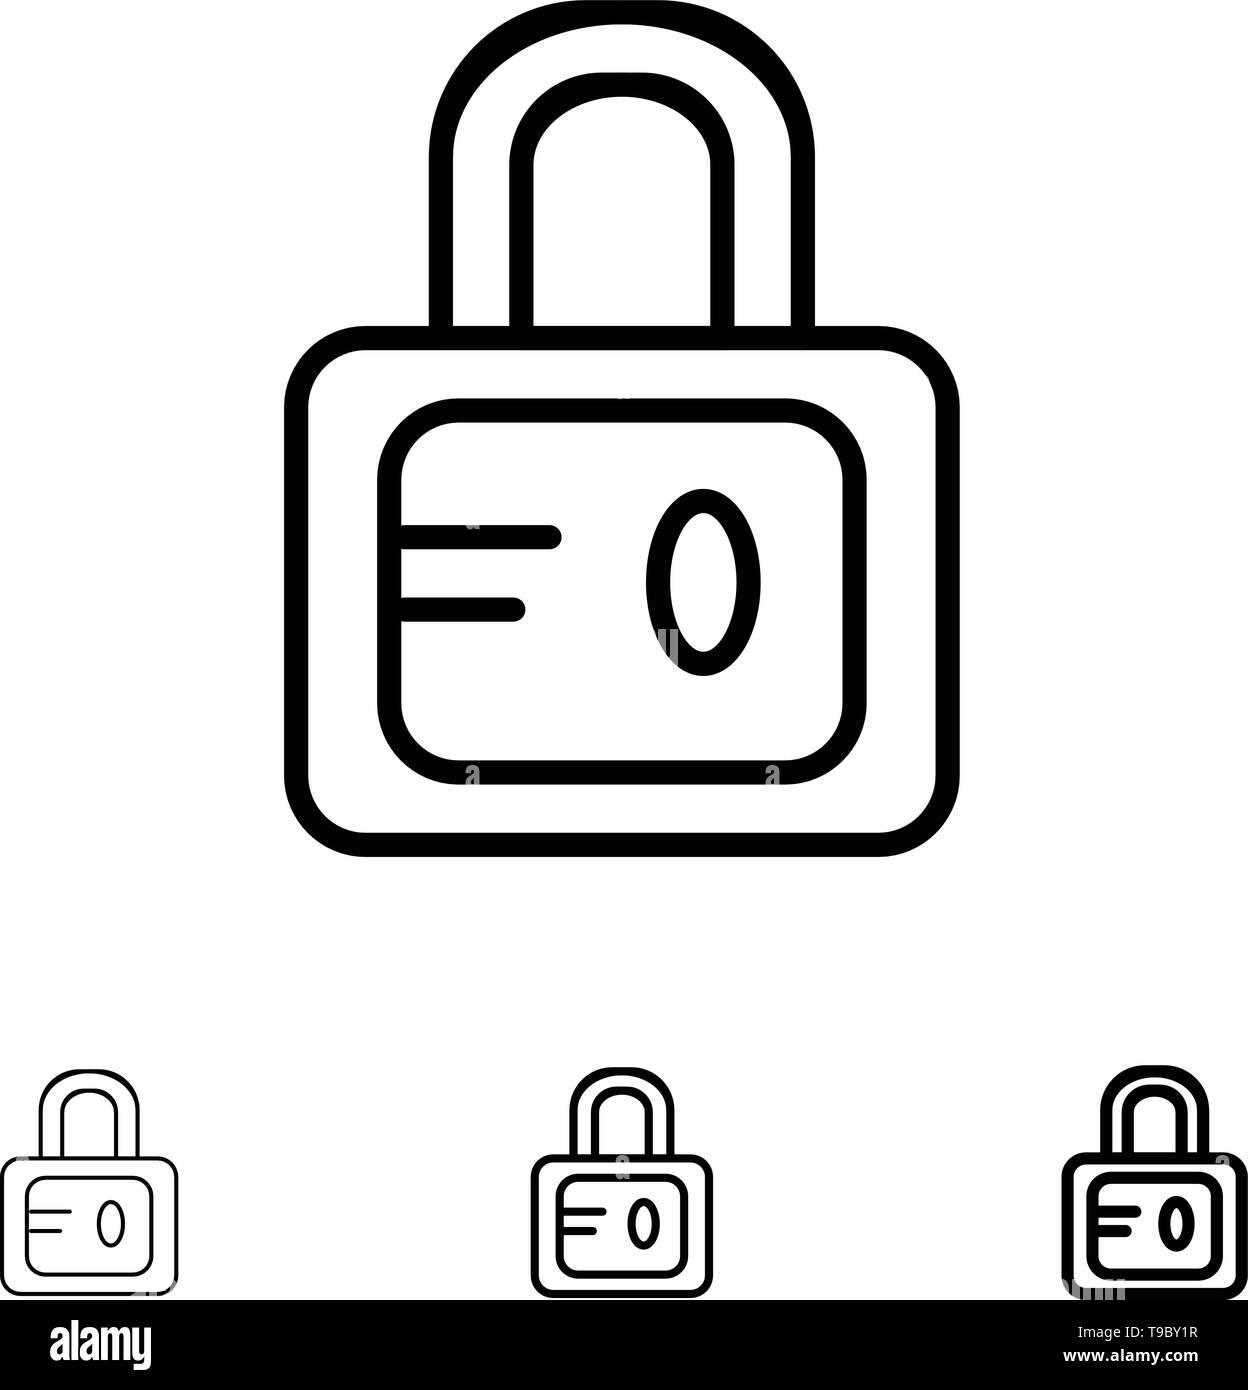 Lock, School, Study Bold and thin black line icon set - Stock Image